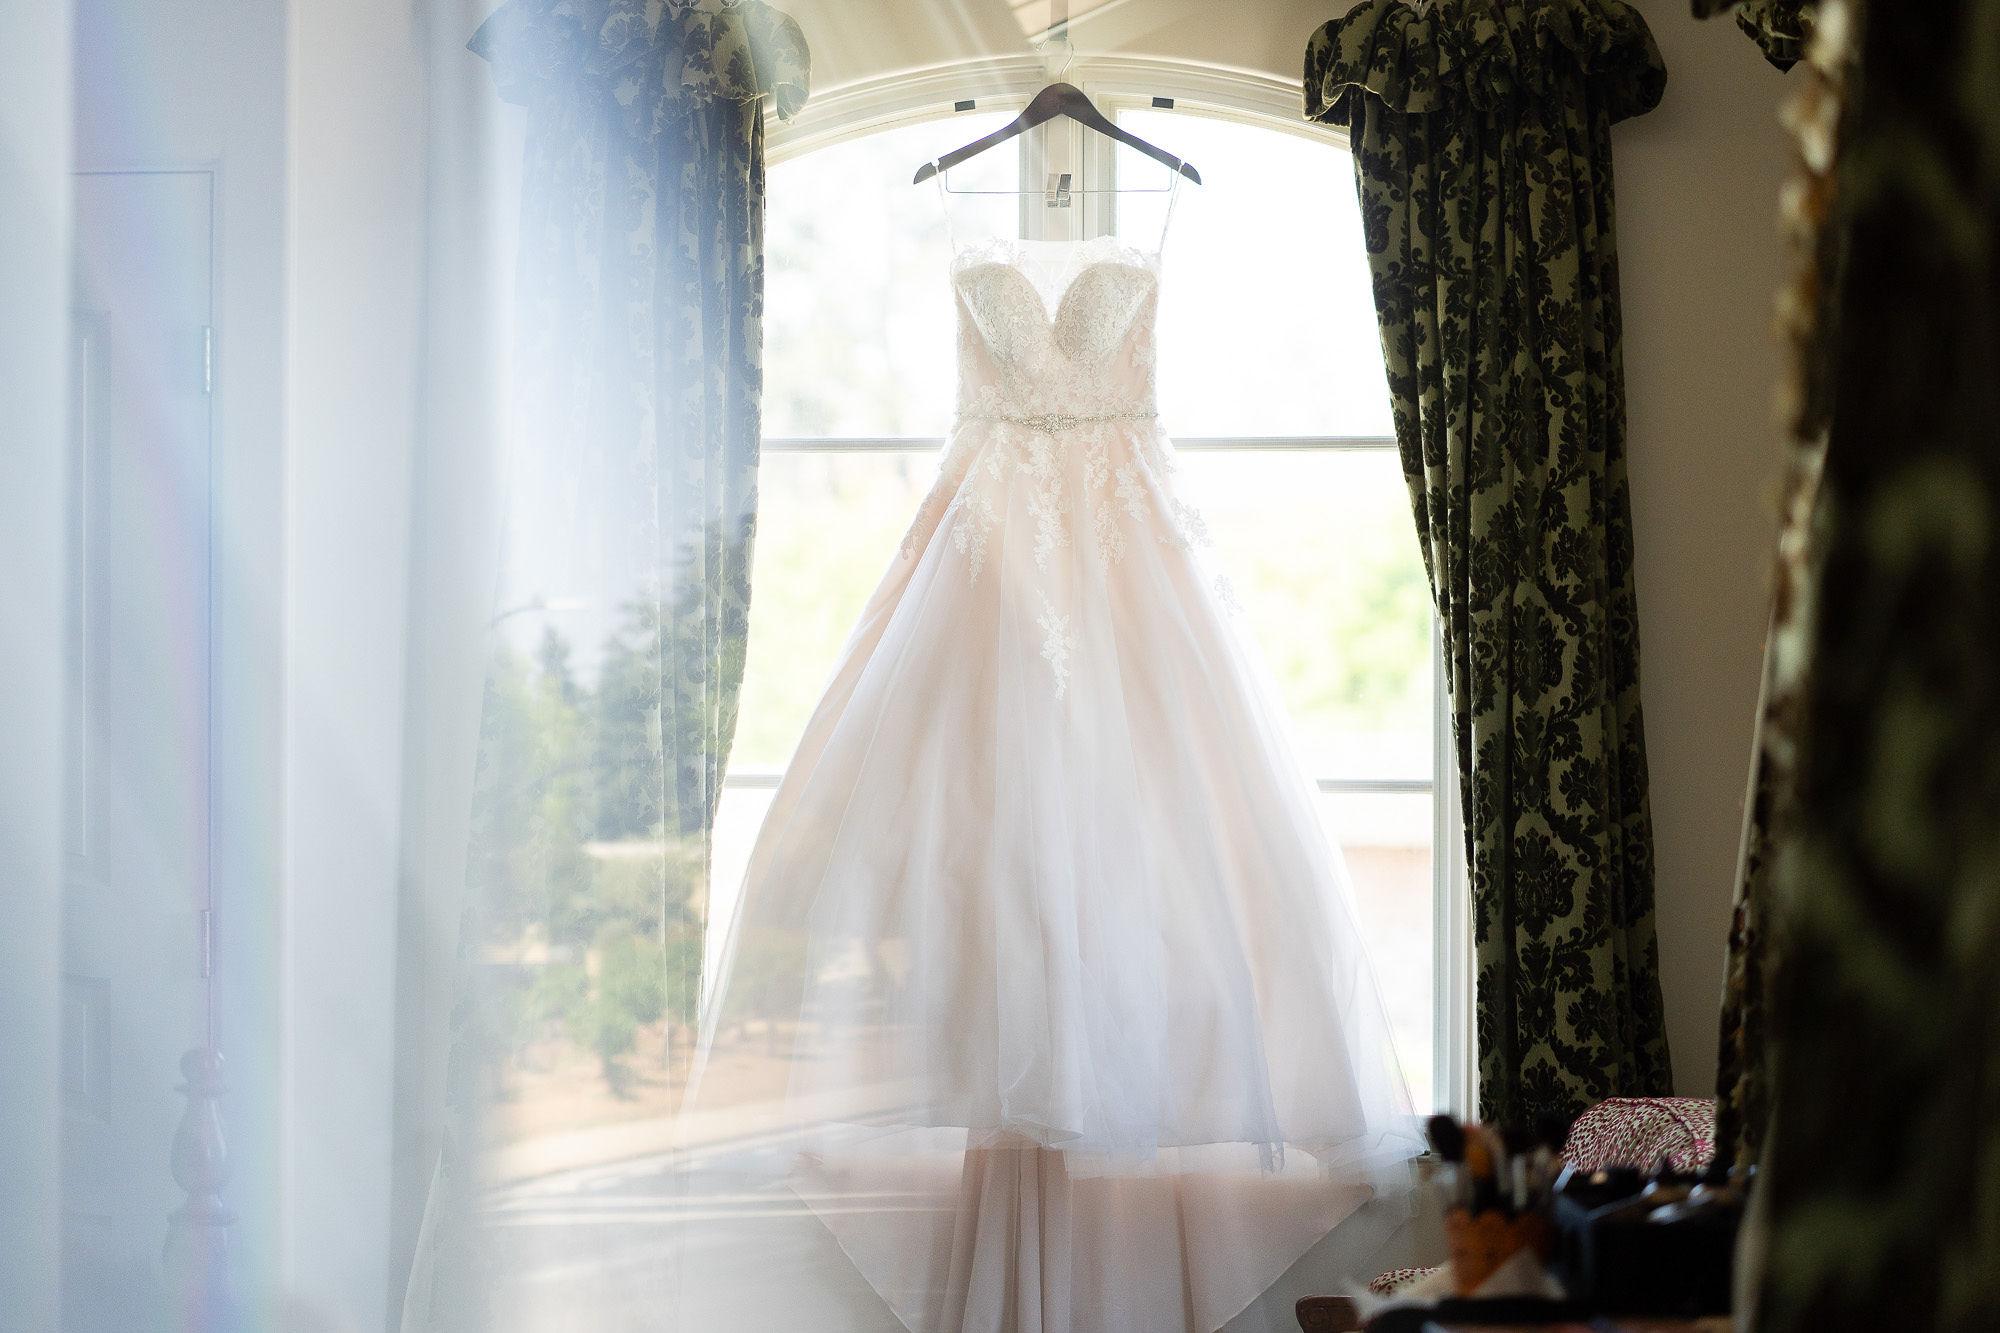 Resized-S&S-WeddingHighlights-3.jpg